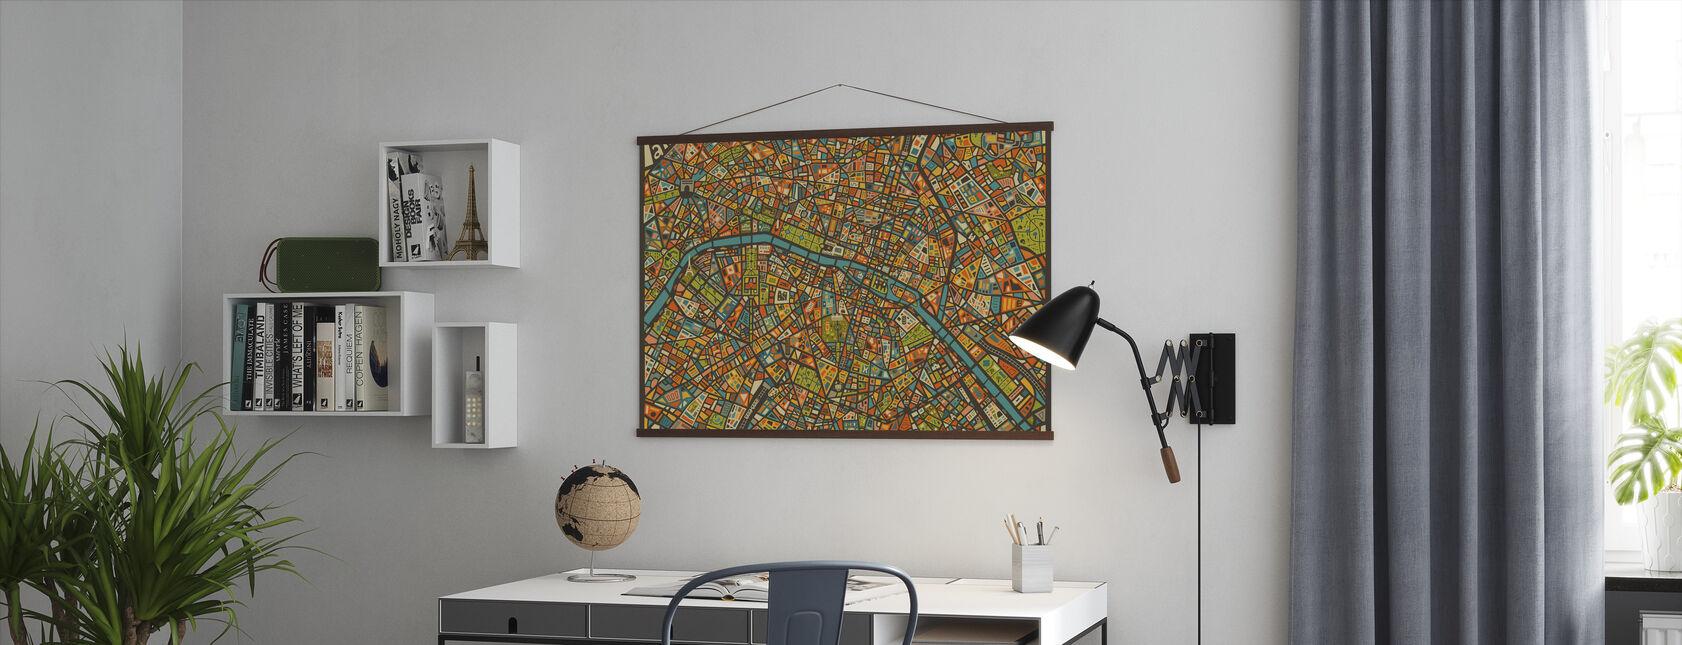 Paris Street Map - Poster - Office